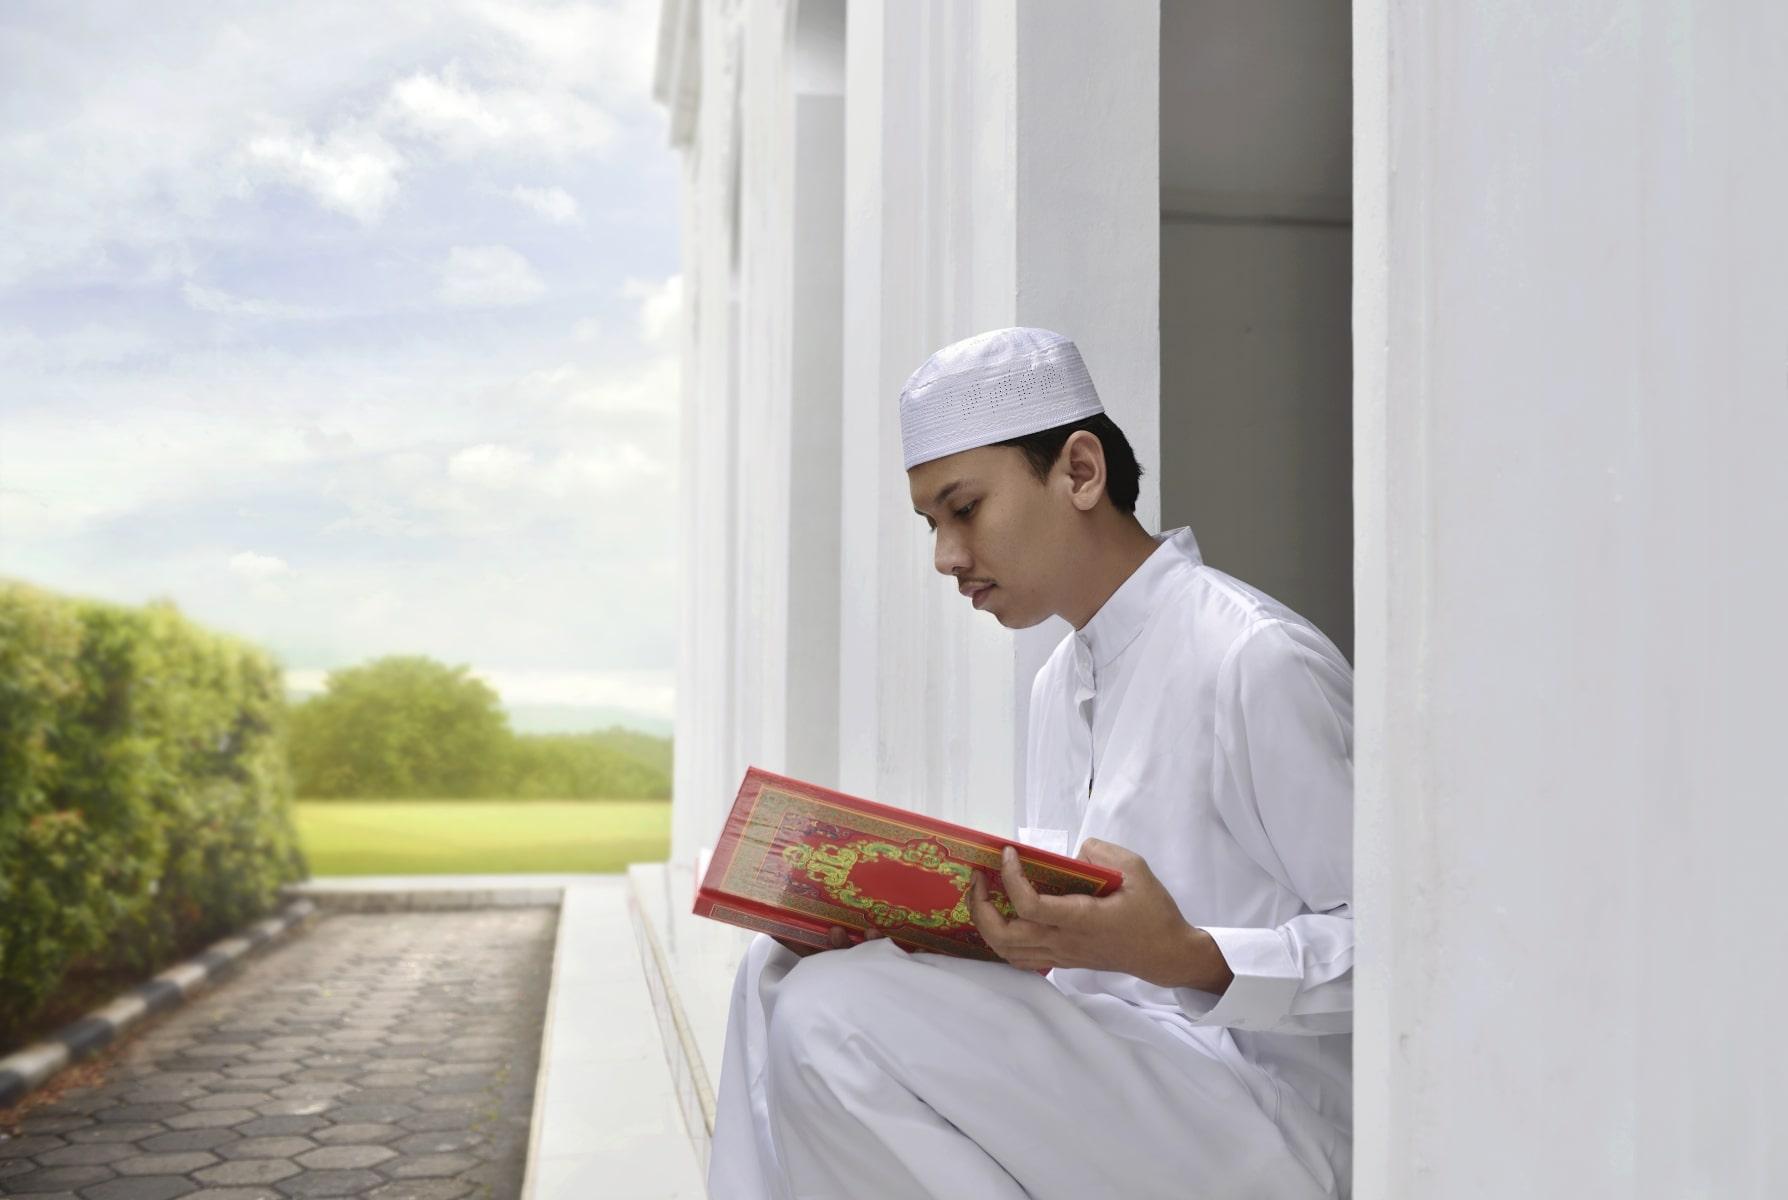 A srca se, doista, kad se Allah spomene, smiruju!